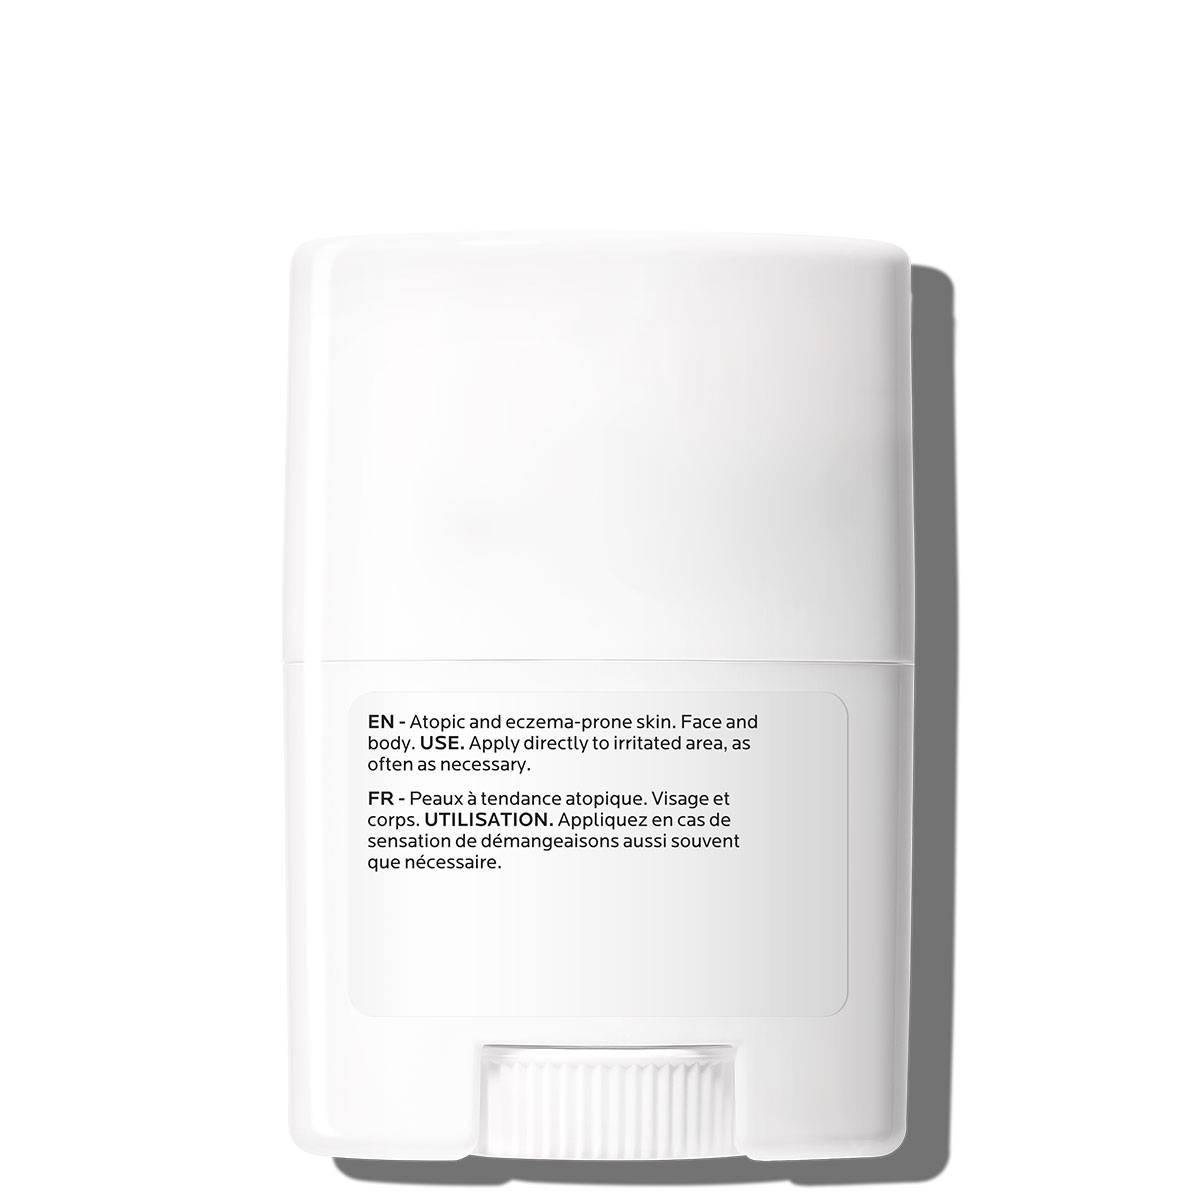 La Roche Posay ProduktSide Tendens til atopi Lipikar Stick AP 15ml 3337875566254